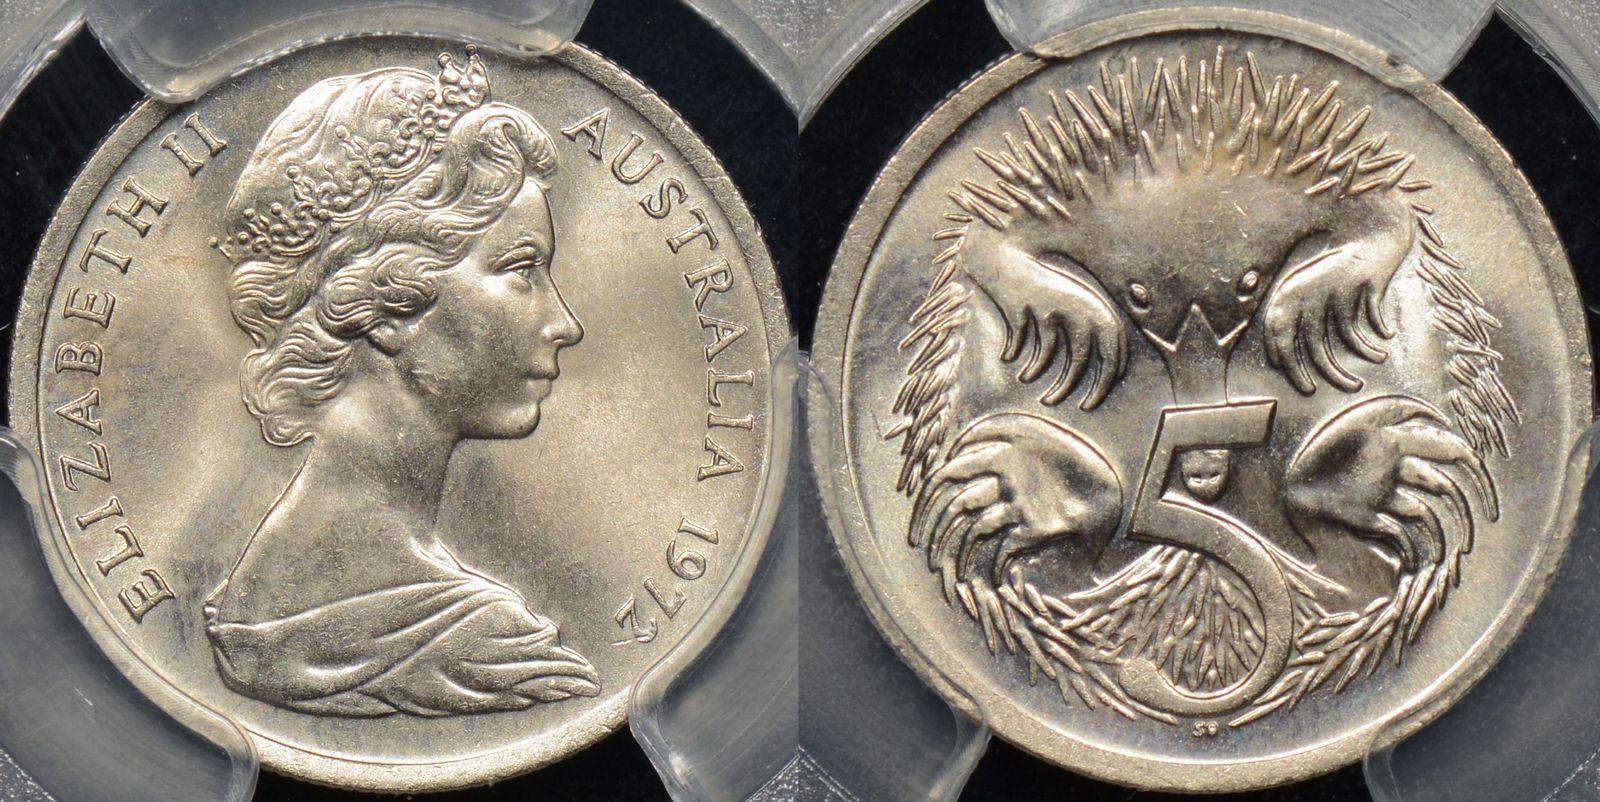 australian 1972 5 cent coin